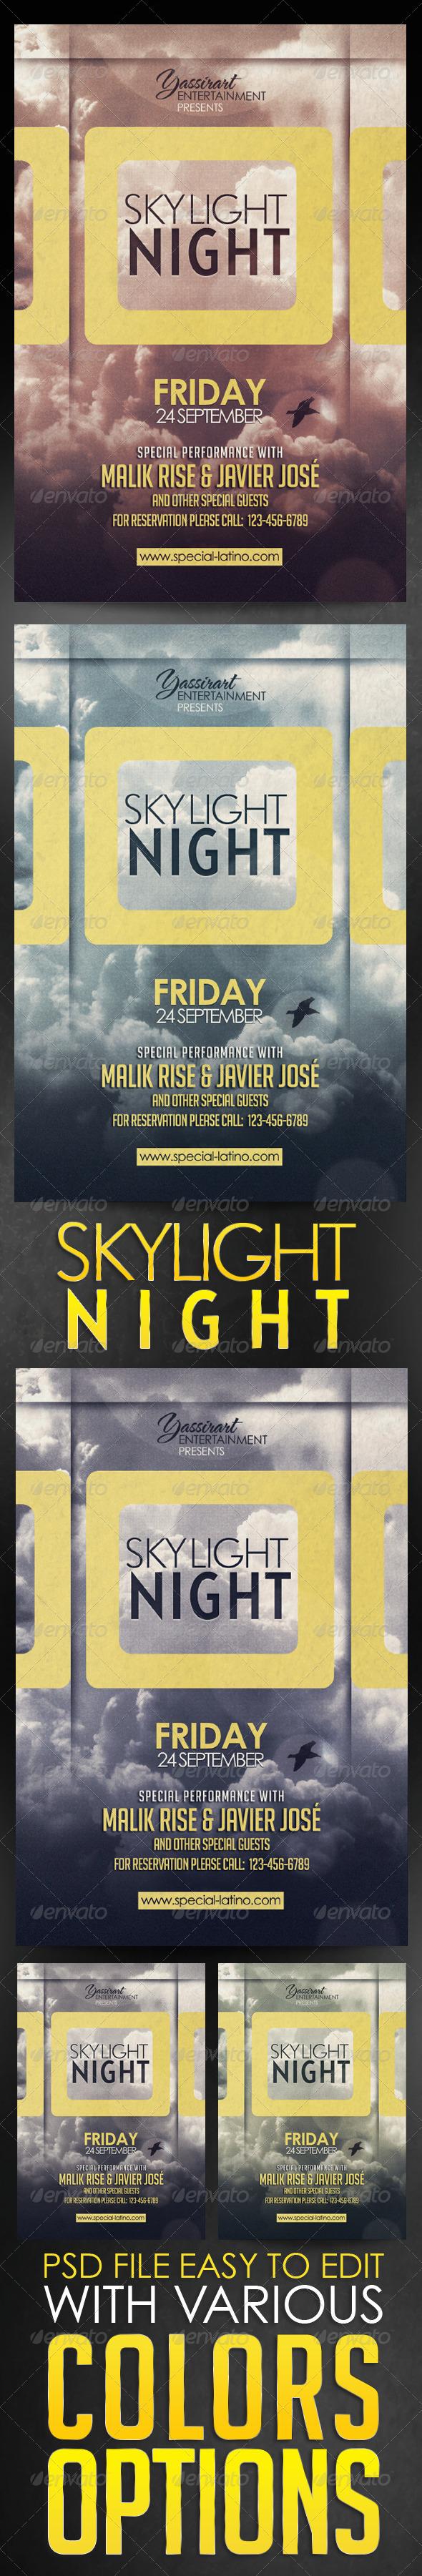 GraphicRiver Skylight Night 3 5722071